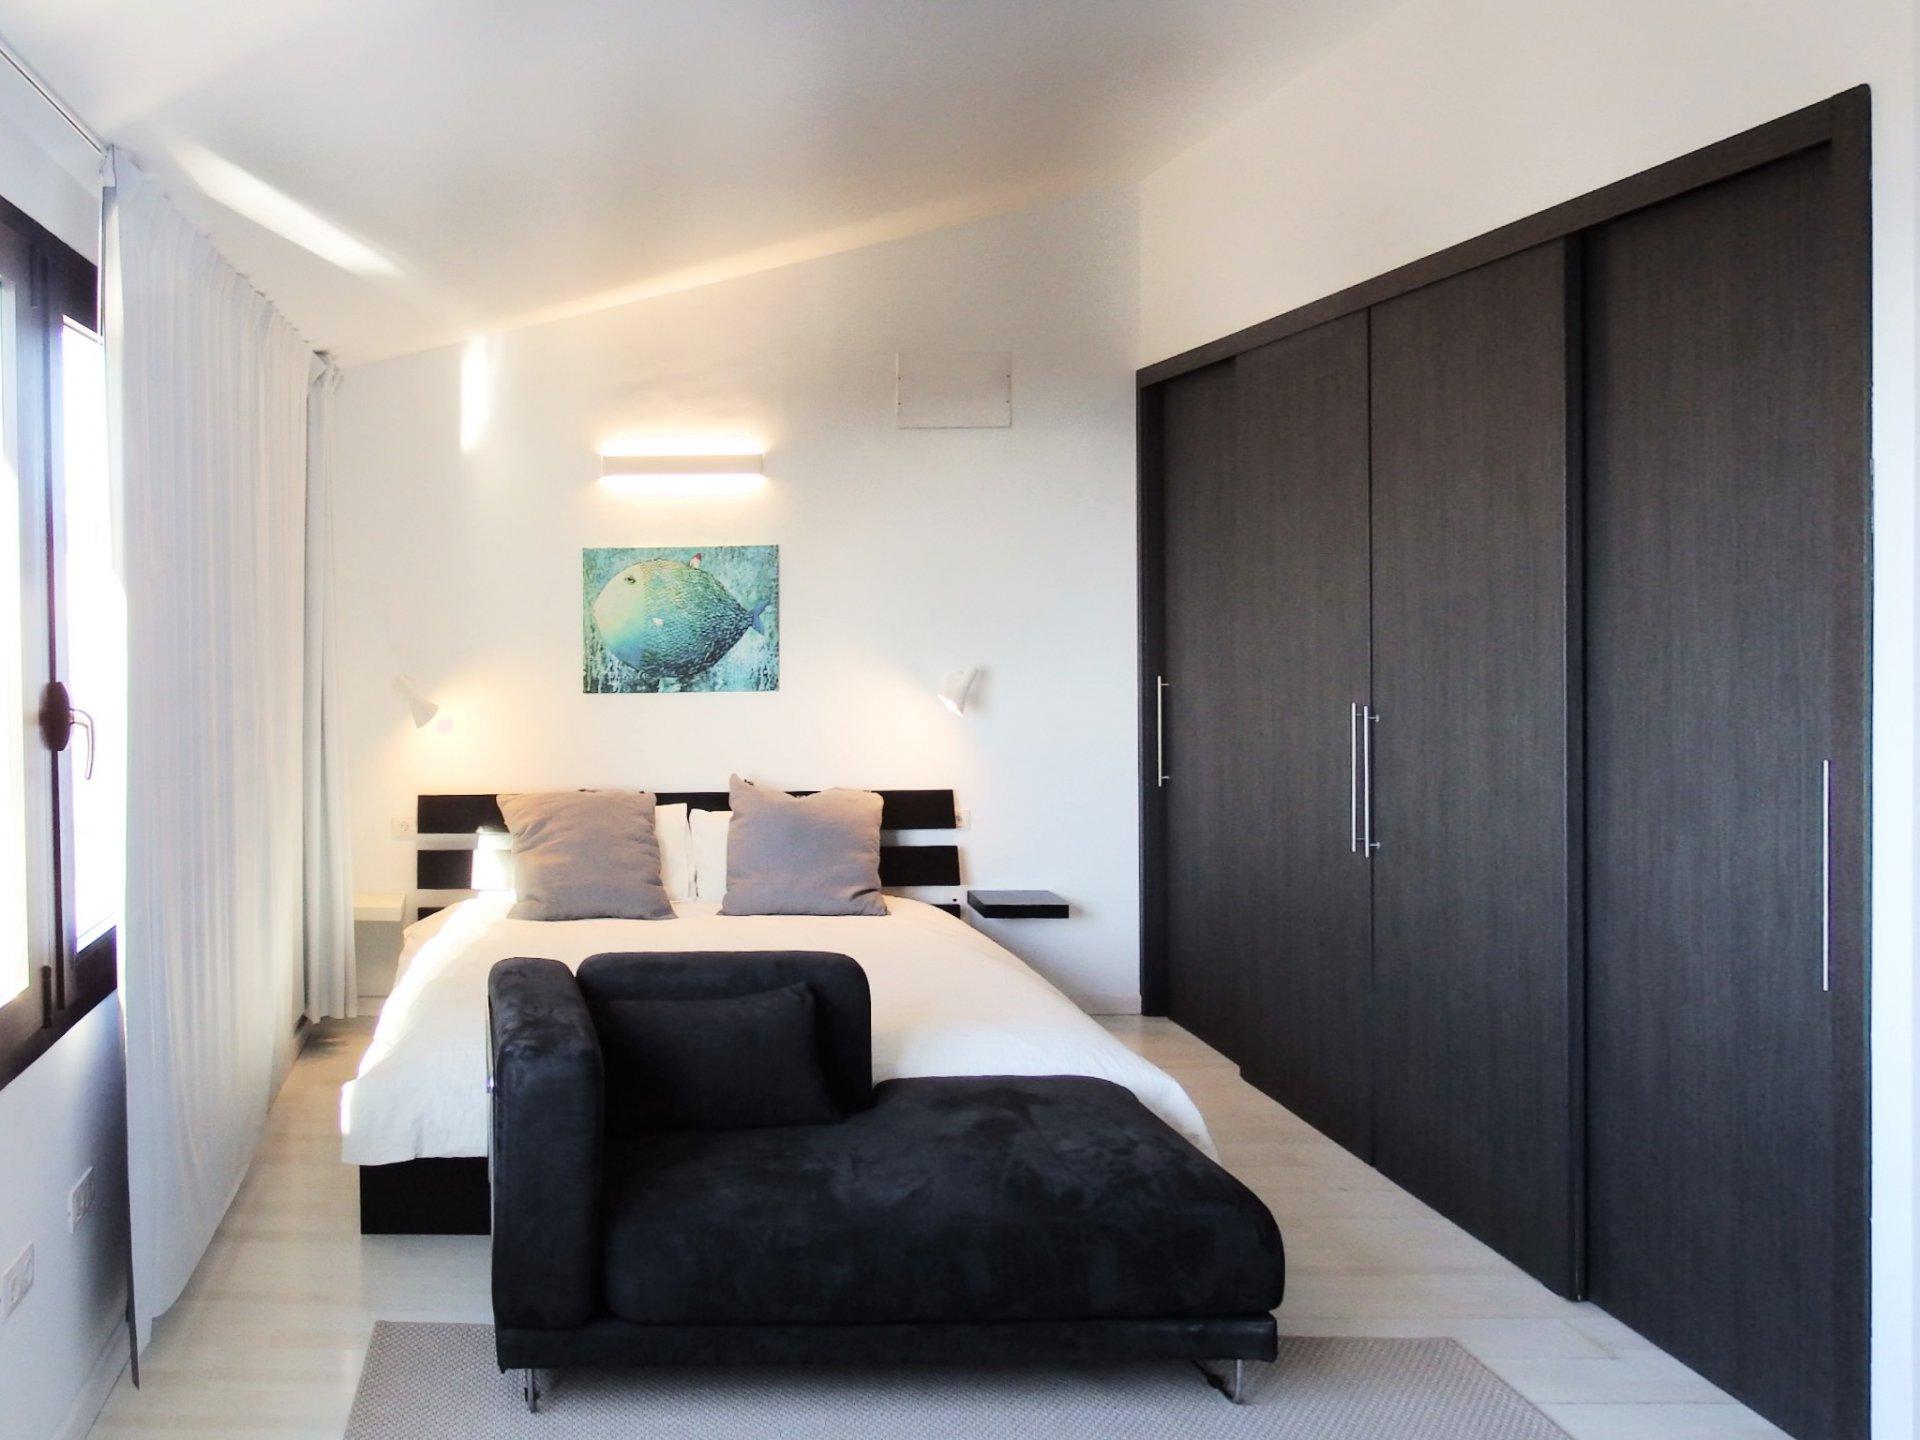 Te huur in San Miguel, luxe huis